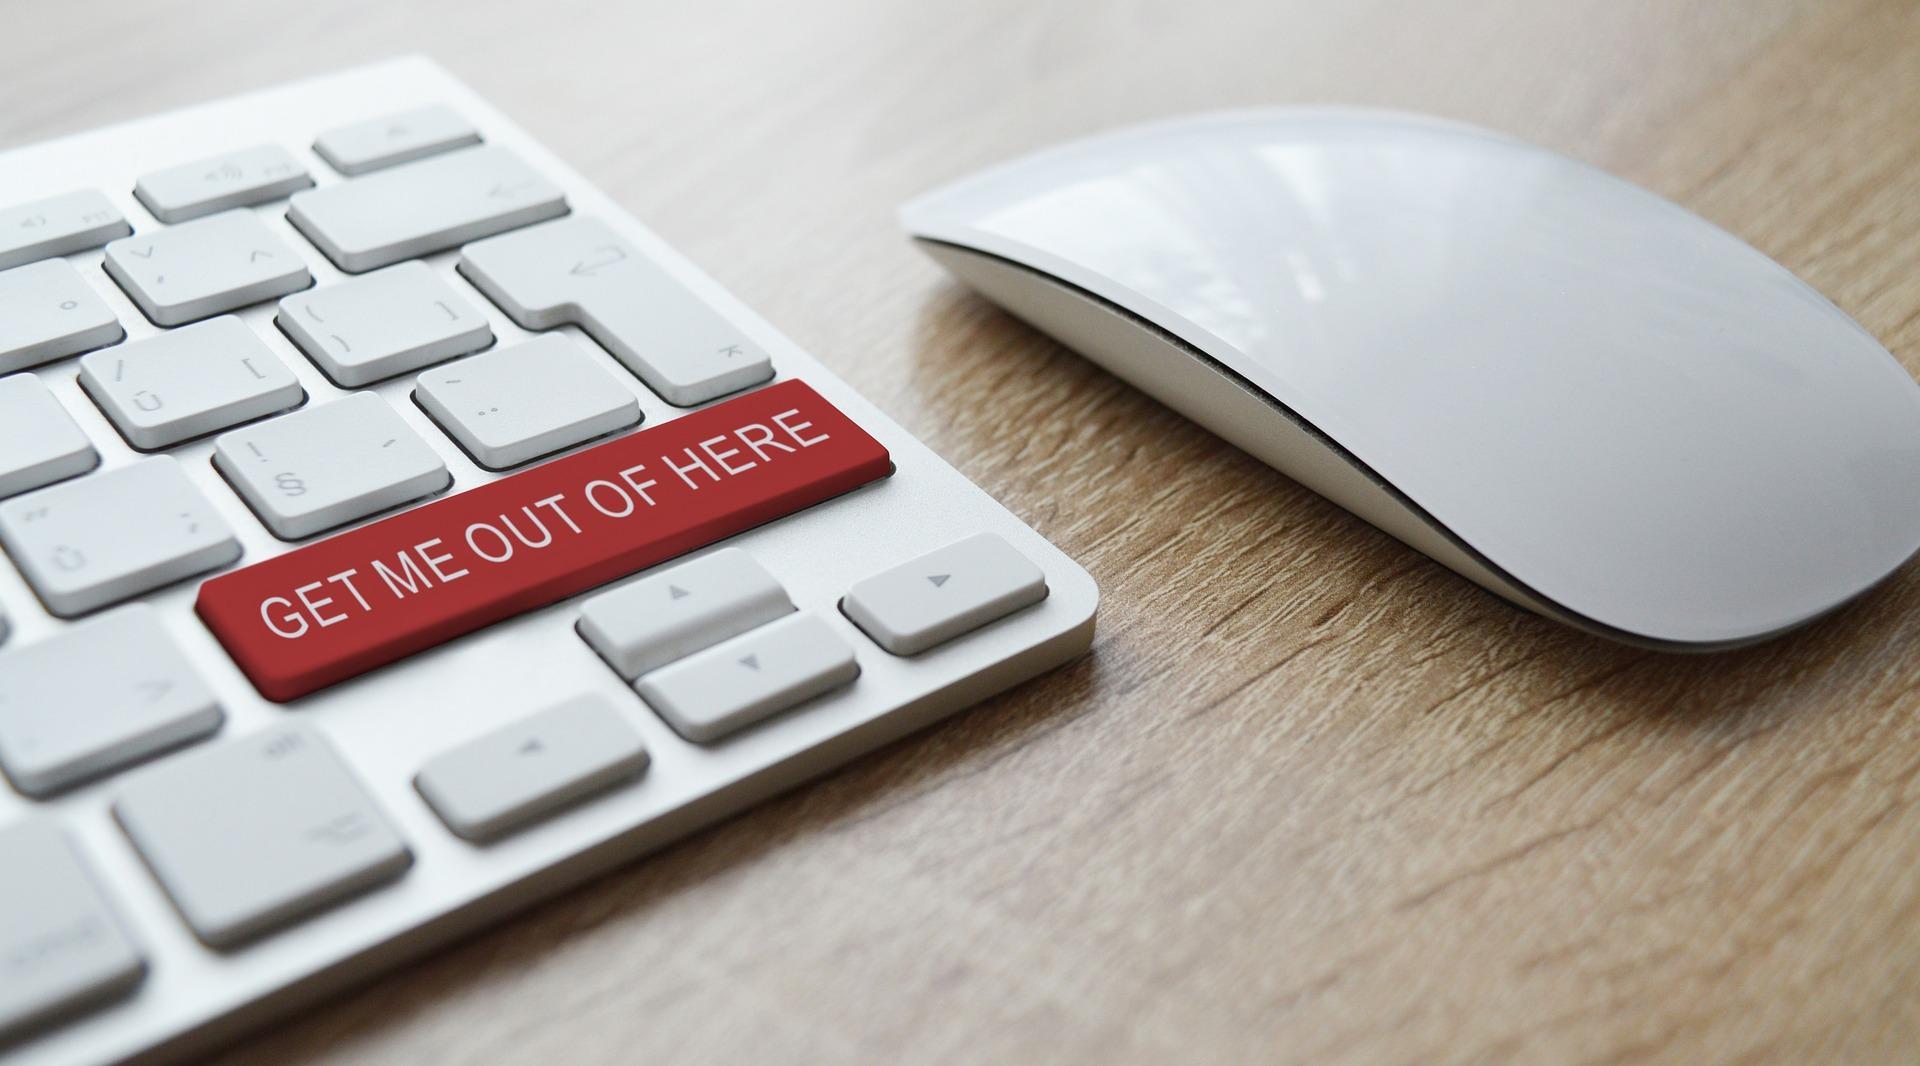 Is Bummbuum a Scam or Untrustworthy Online Store?